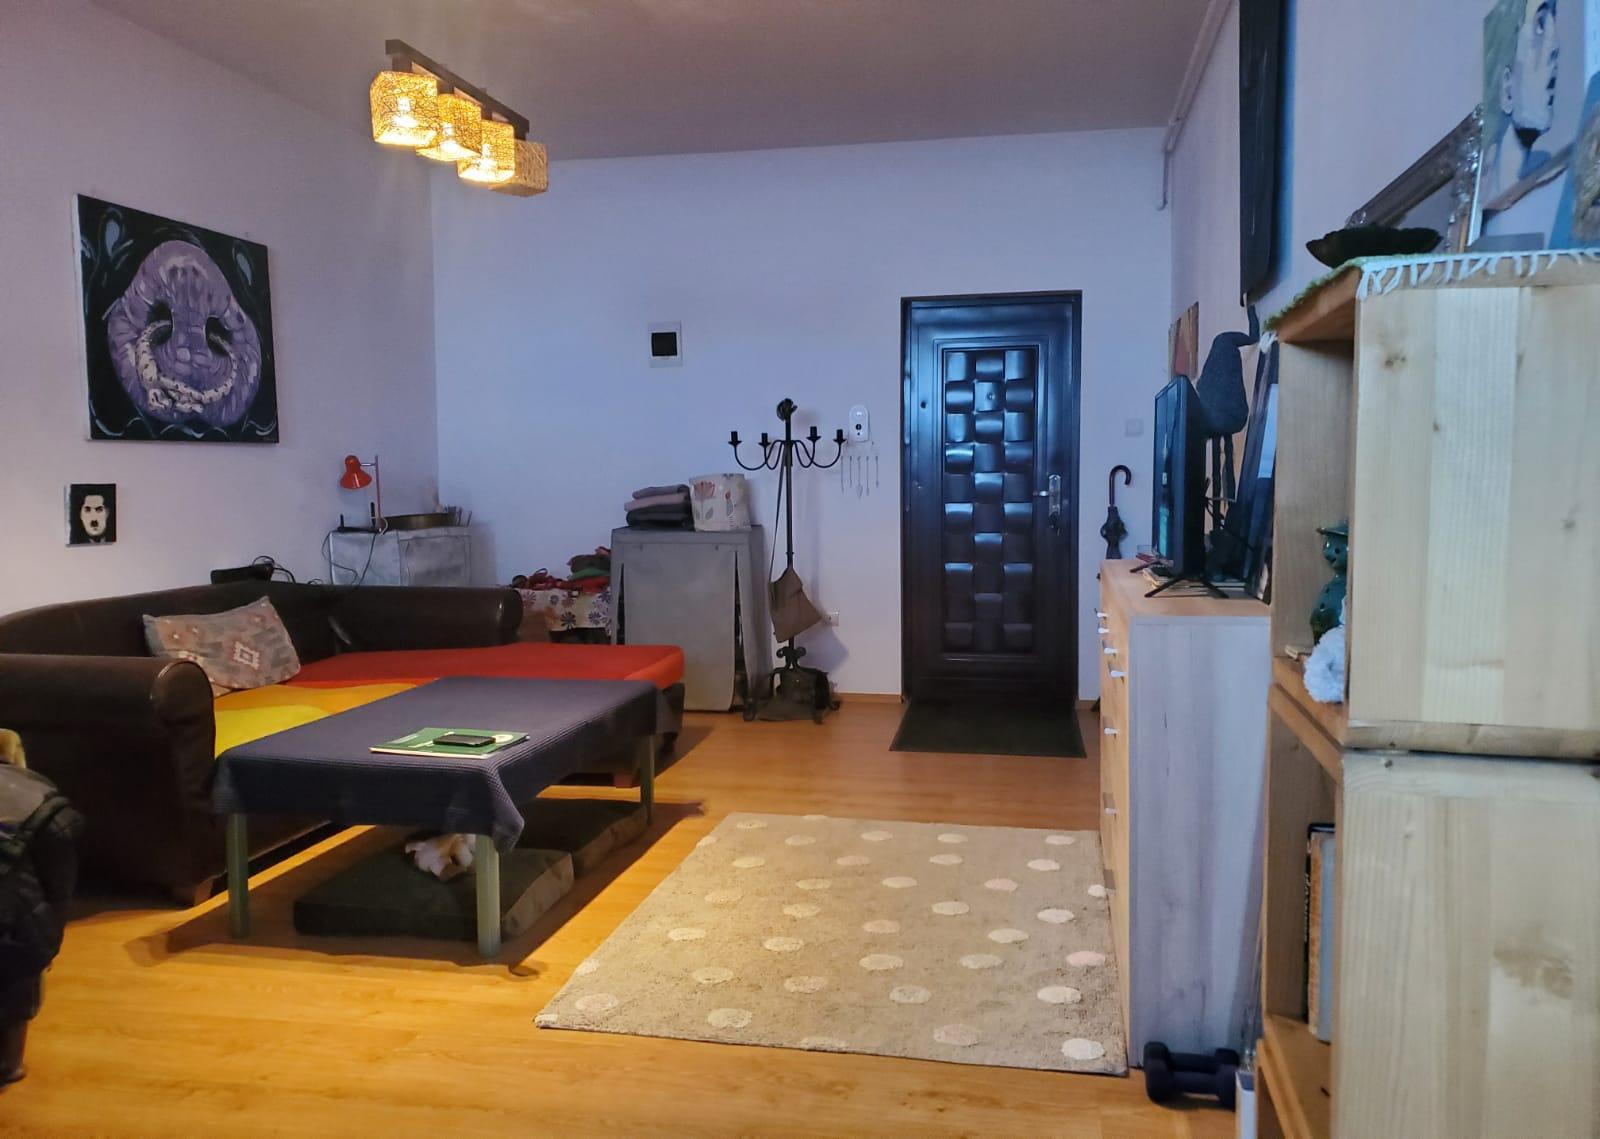 Vand apartament 3 camere zona Parneava-Clujului